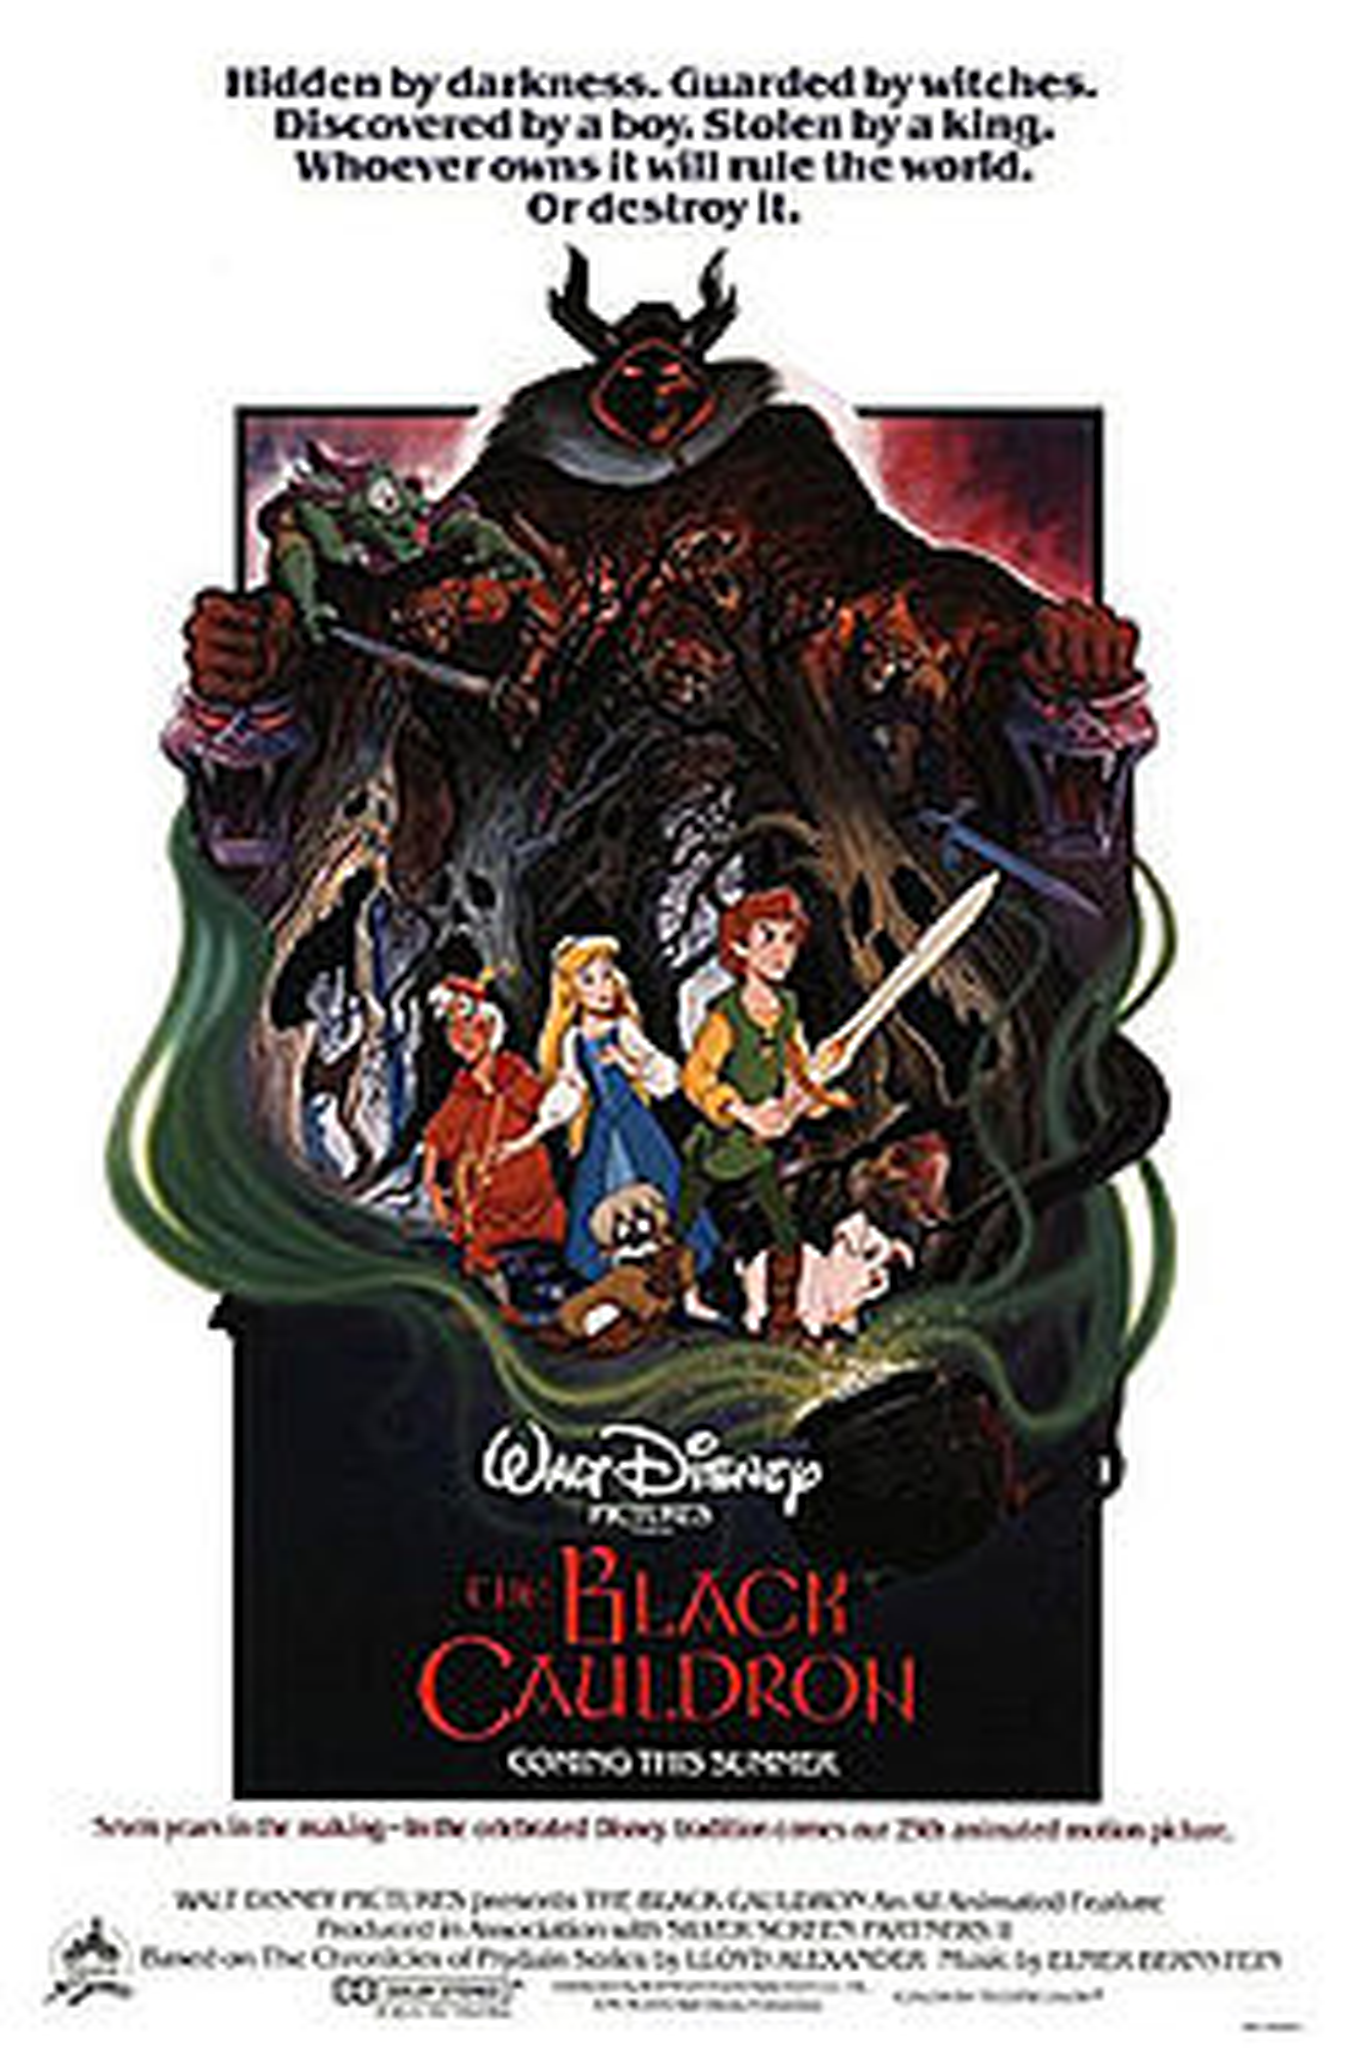 File:220px-The Black Cauldron poster.jpg